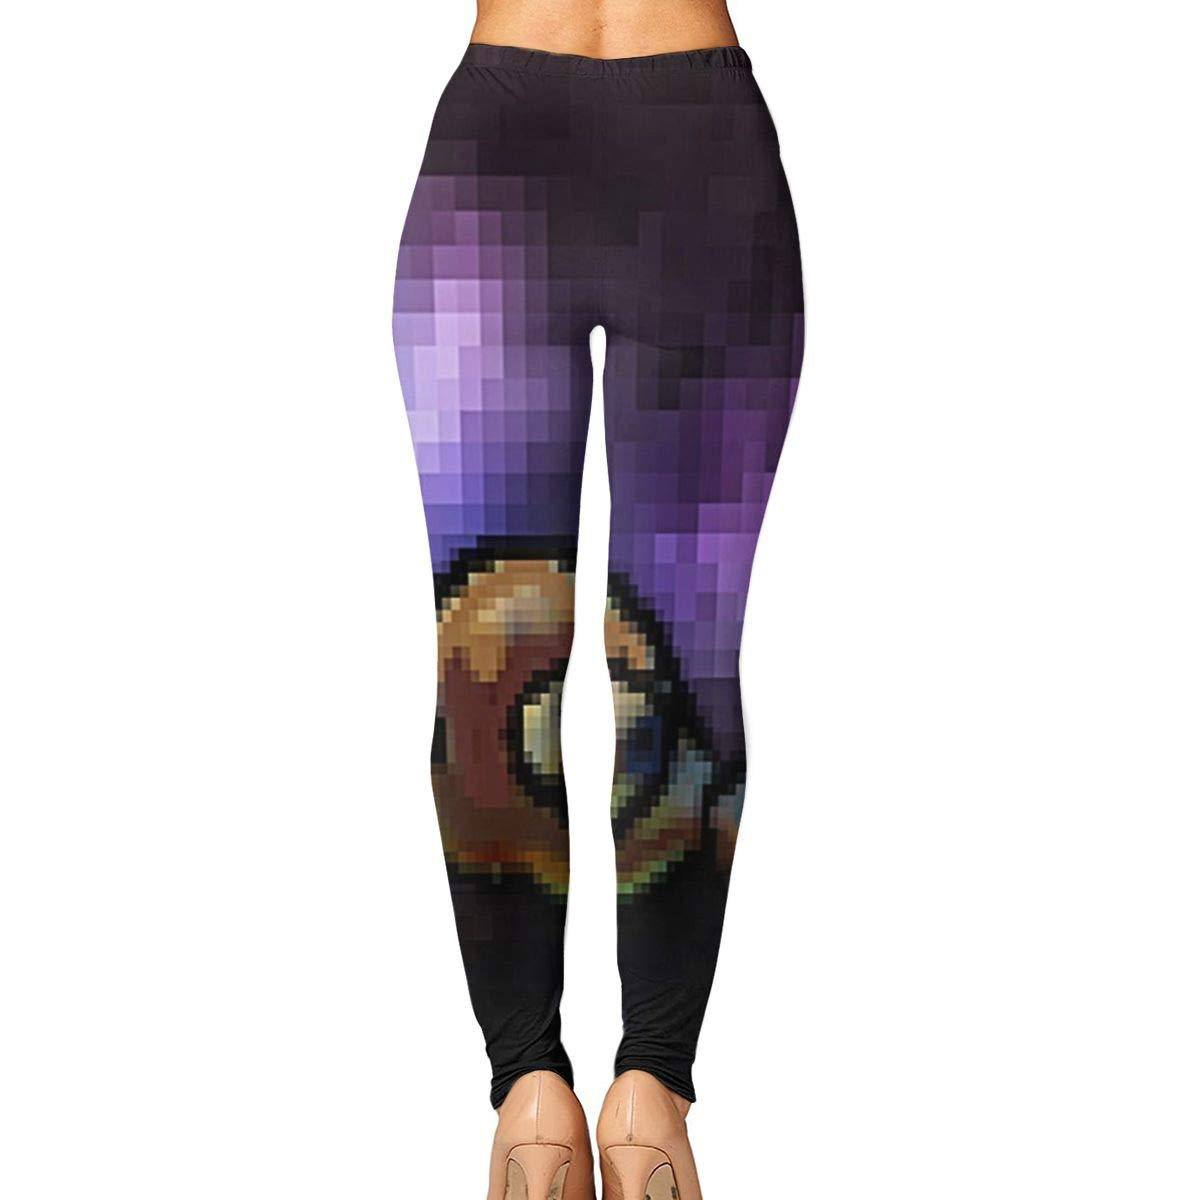 11c5981f1552f6 Amazon.com  Printed Leggings Full-Length Astro Turtle Extra Soft Yoga Pants   Clothing